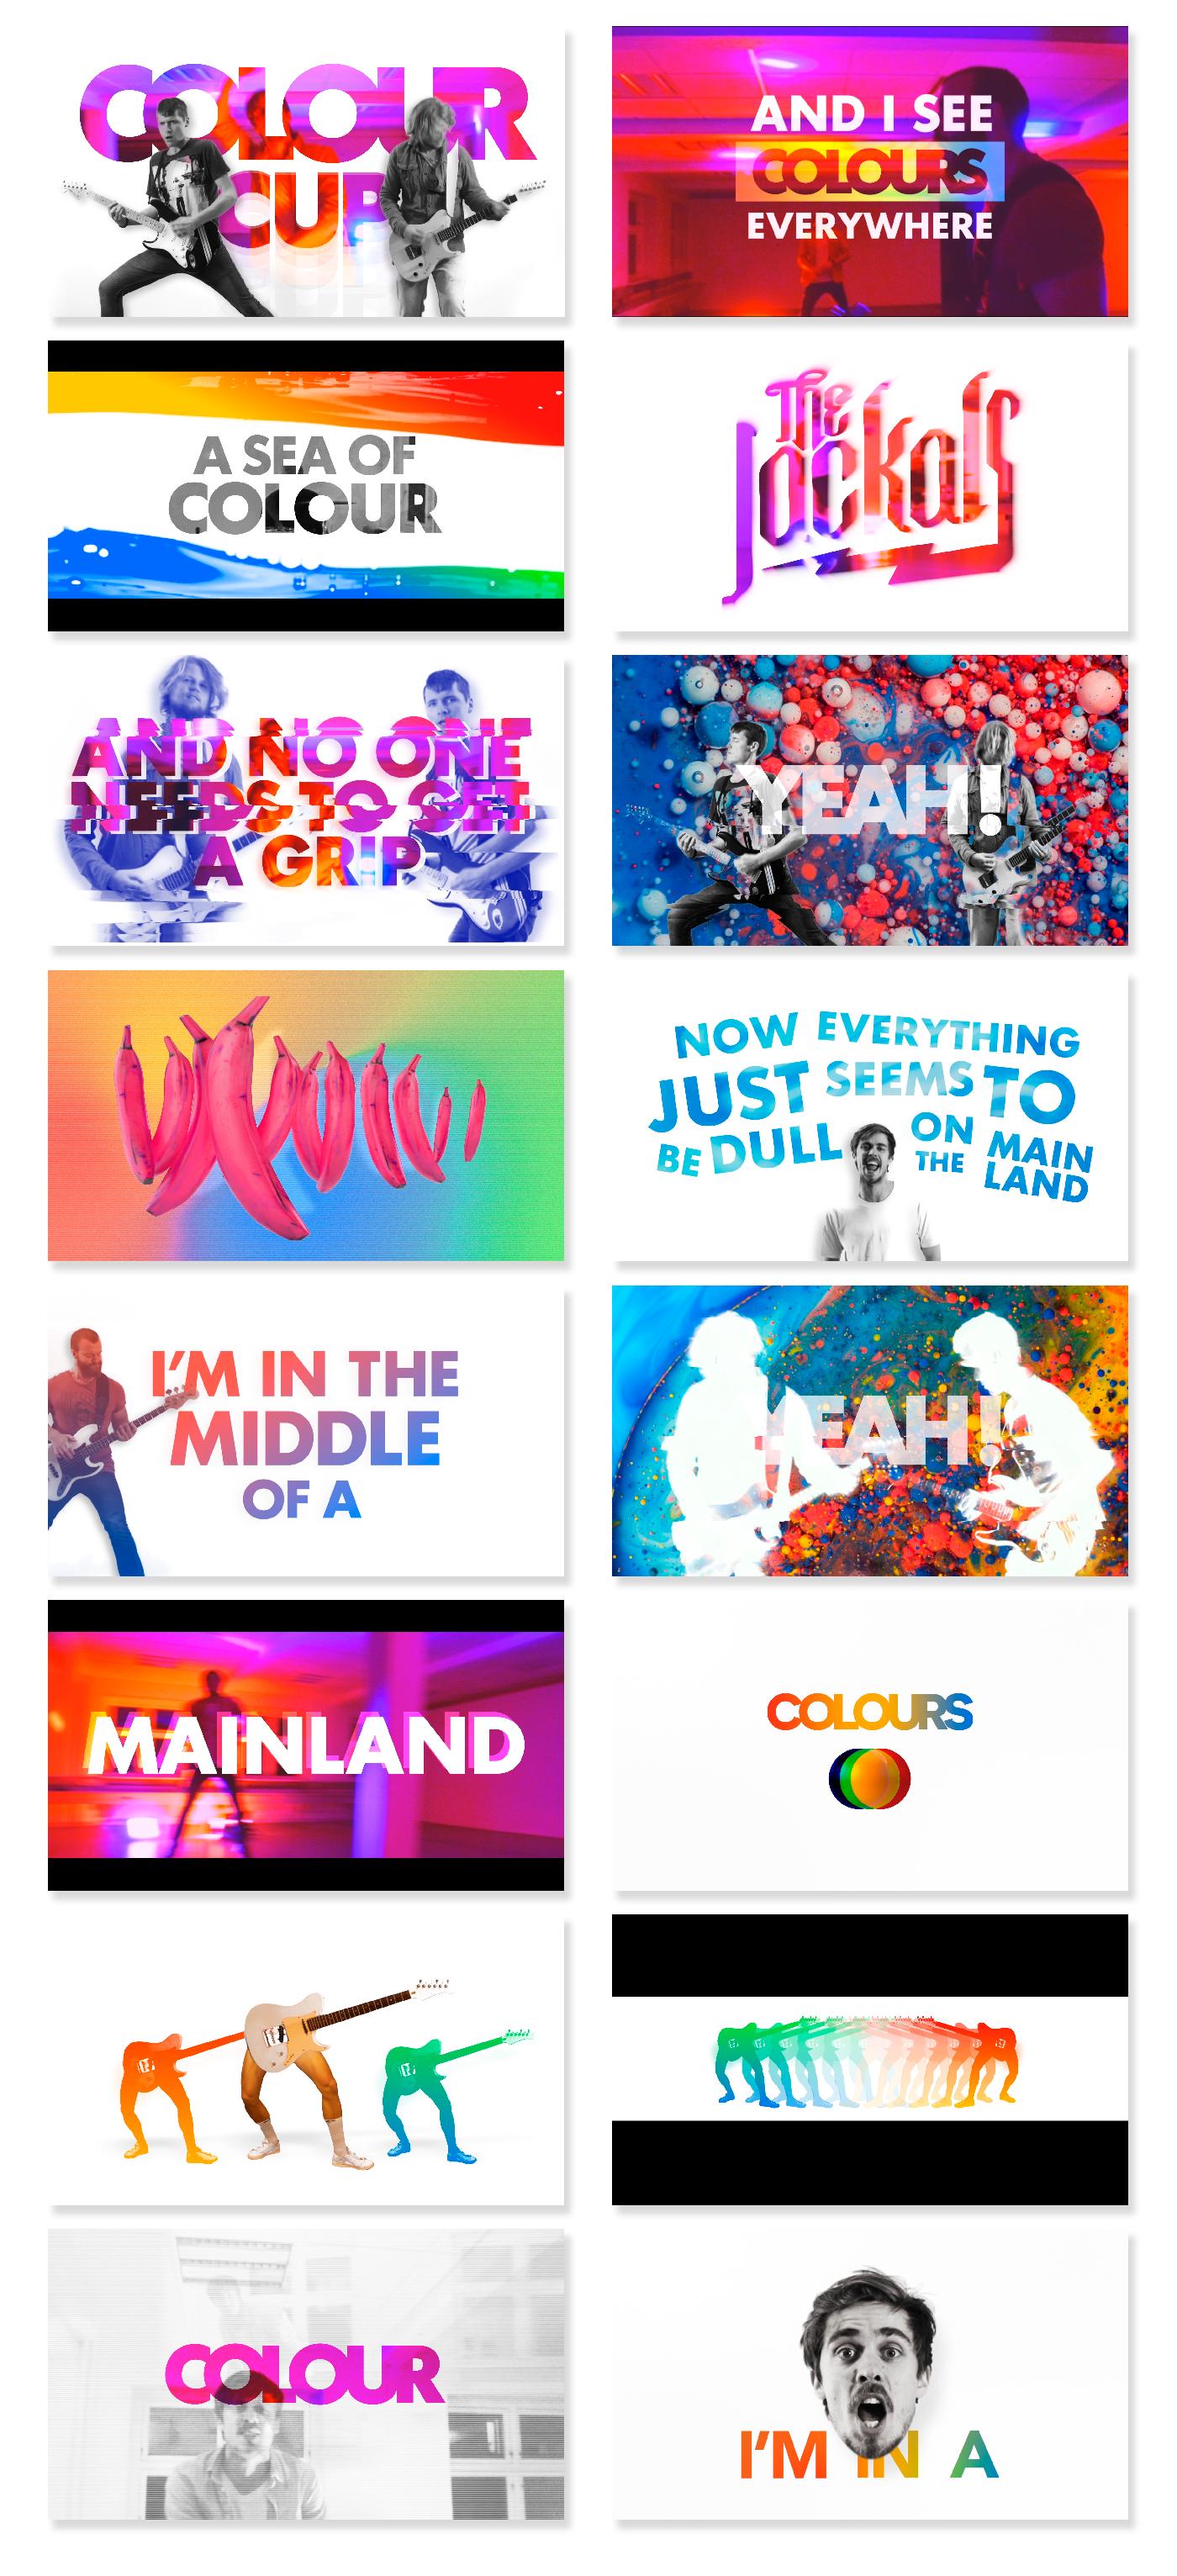 music video rock colours colorful motion design Lyric video party colors gradient